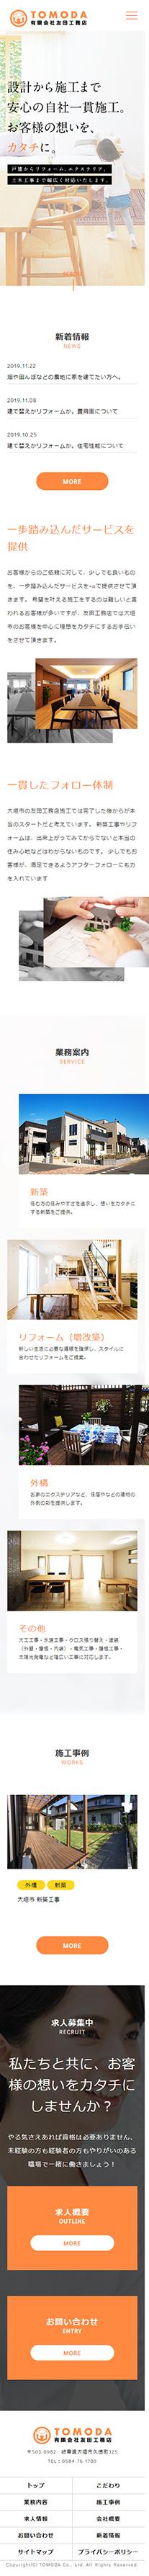 有限会社友田工務店スマホTOP画像